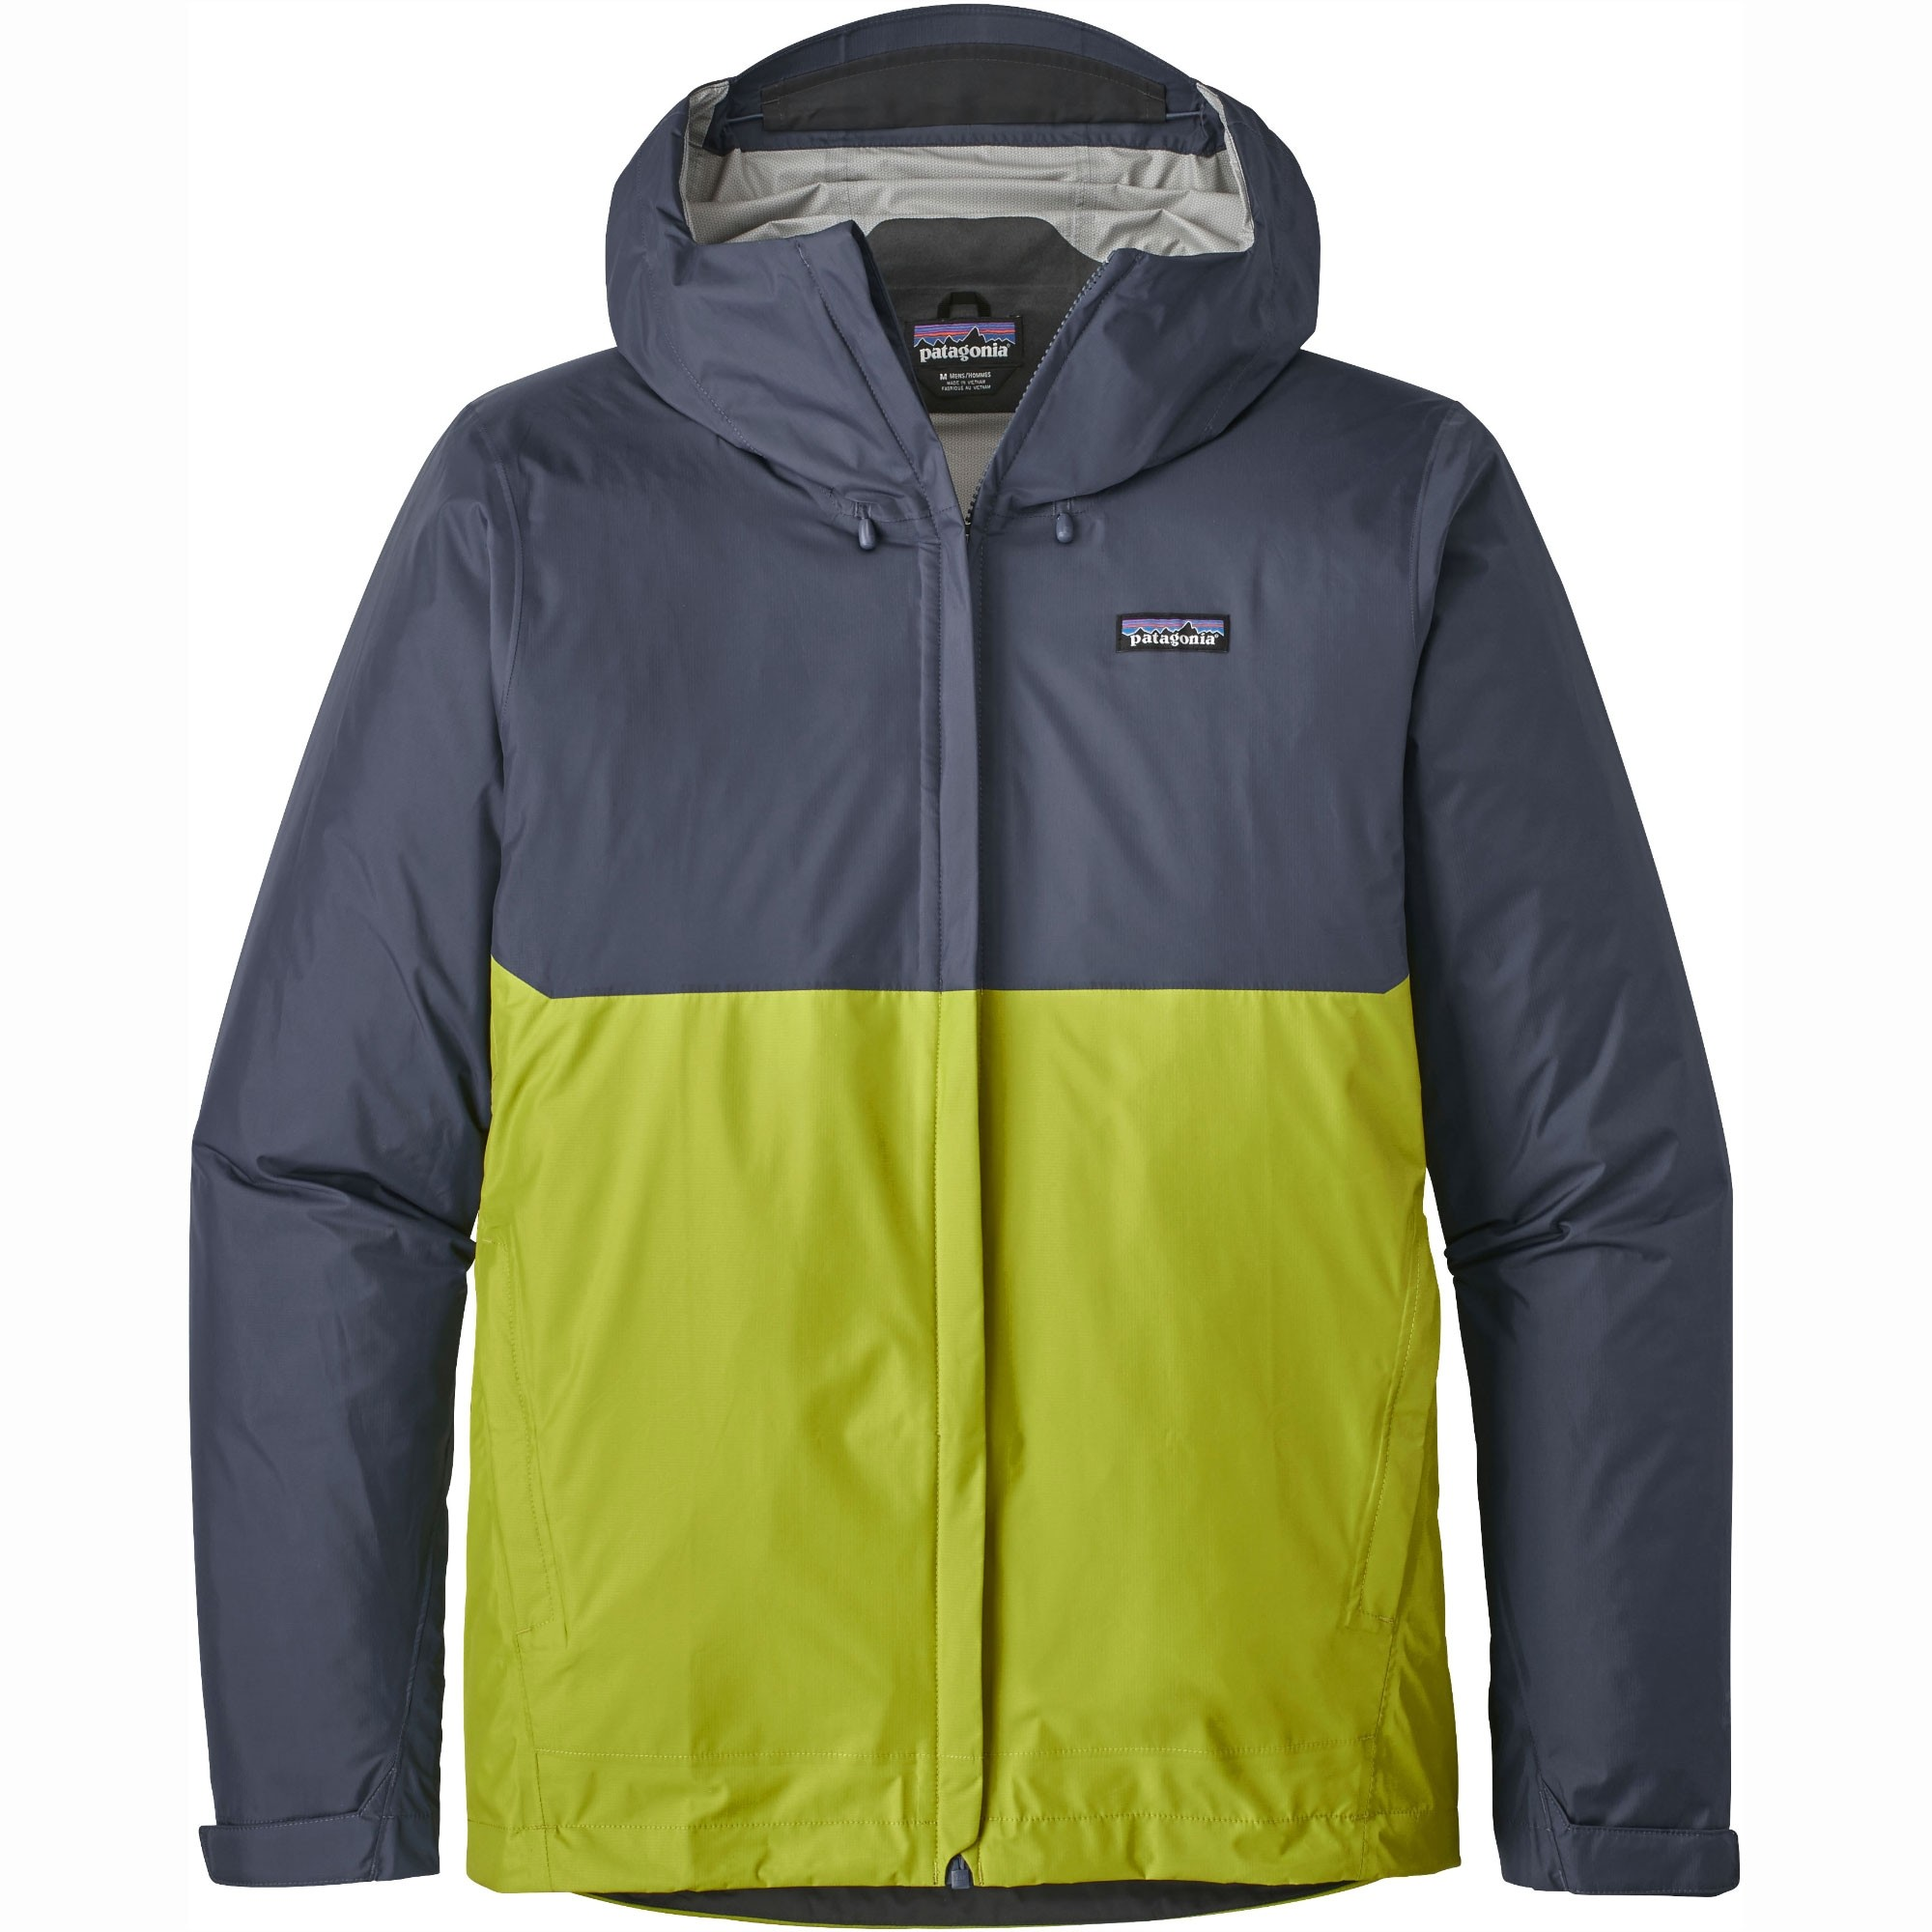 Patagonia-M-Torrentshell-Jacket-Dolomite-Blue-Light-Gecko-Green-S18.jpg